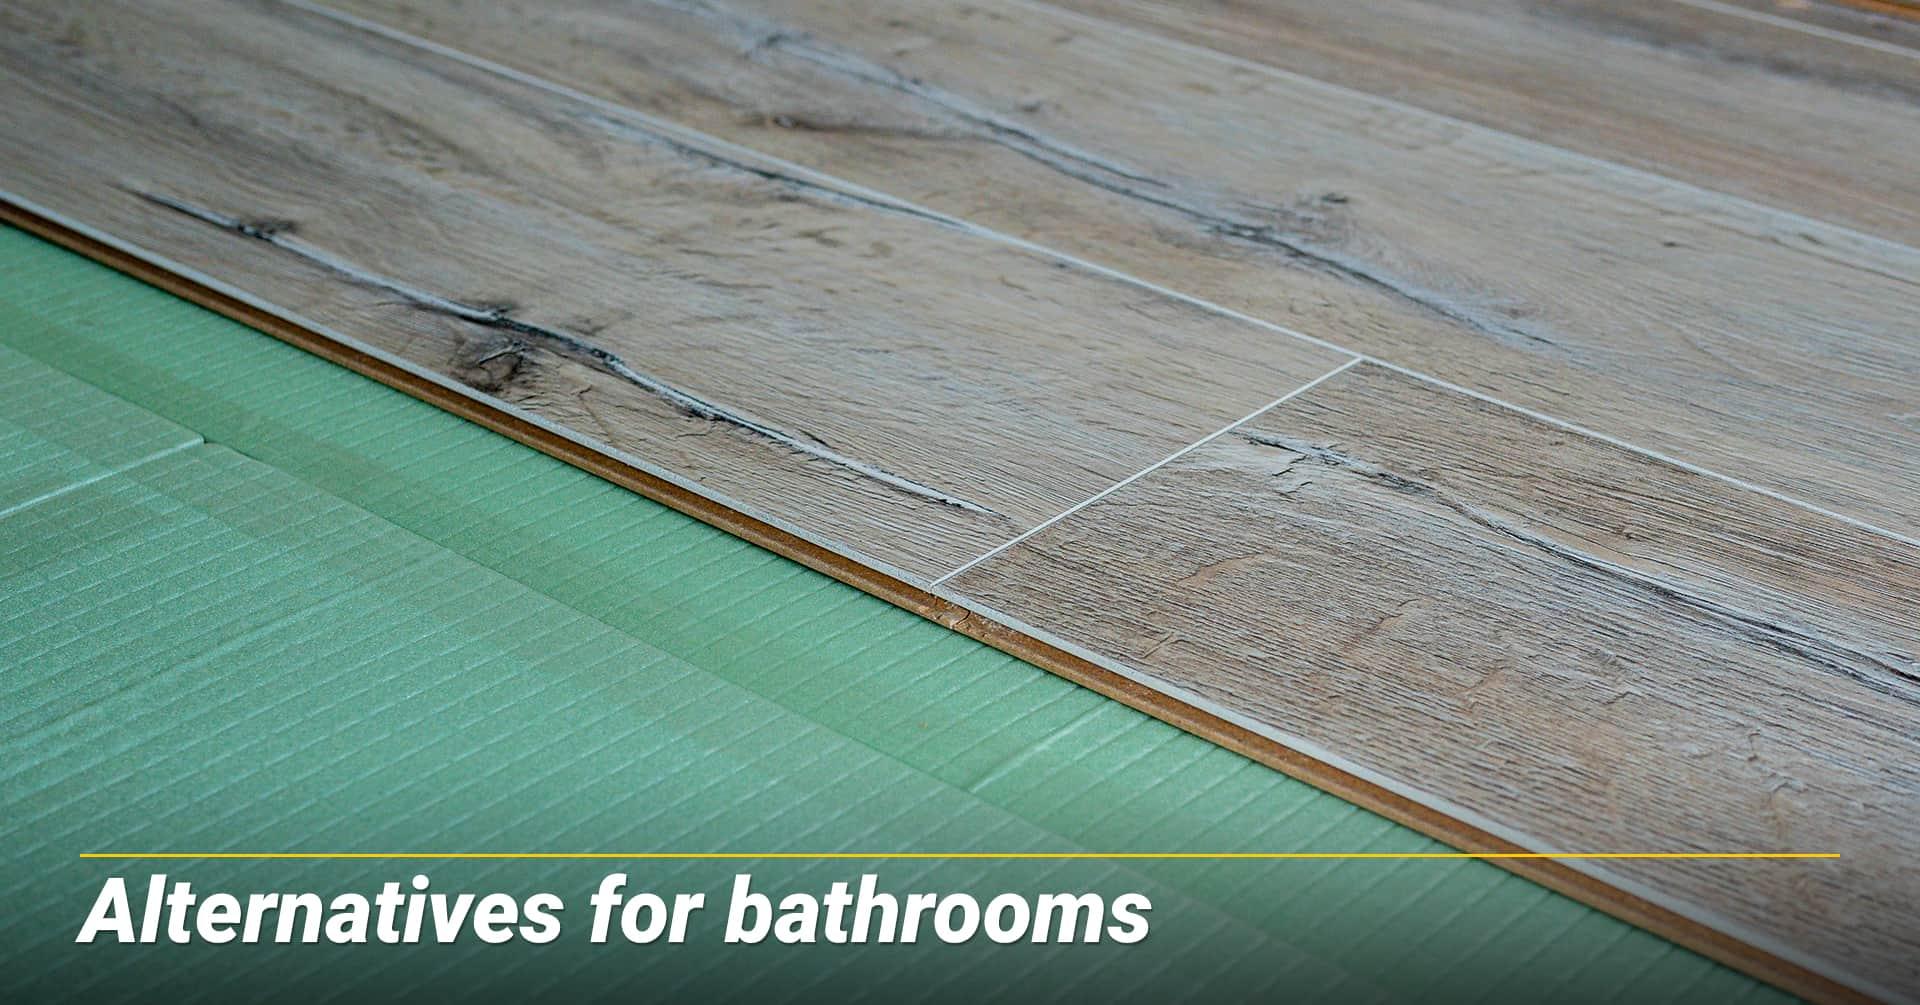 Alternatives for bathrooms